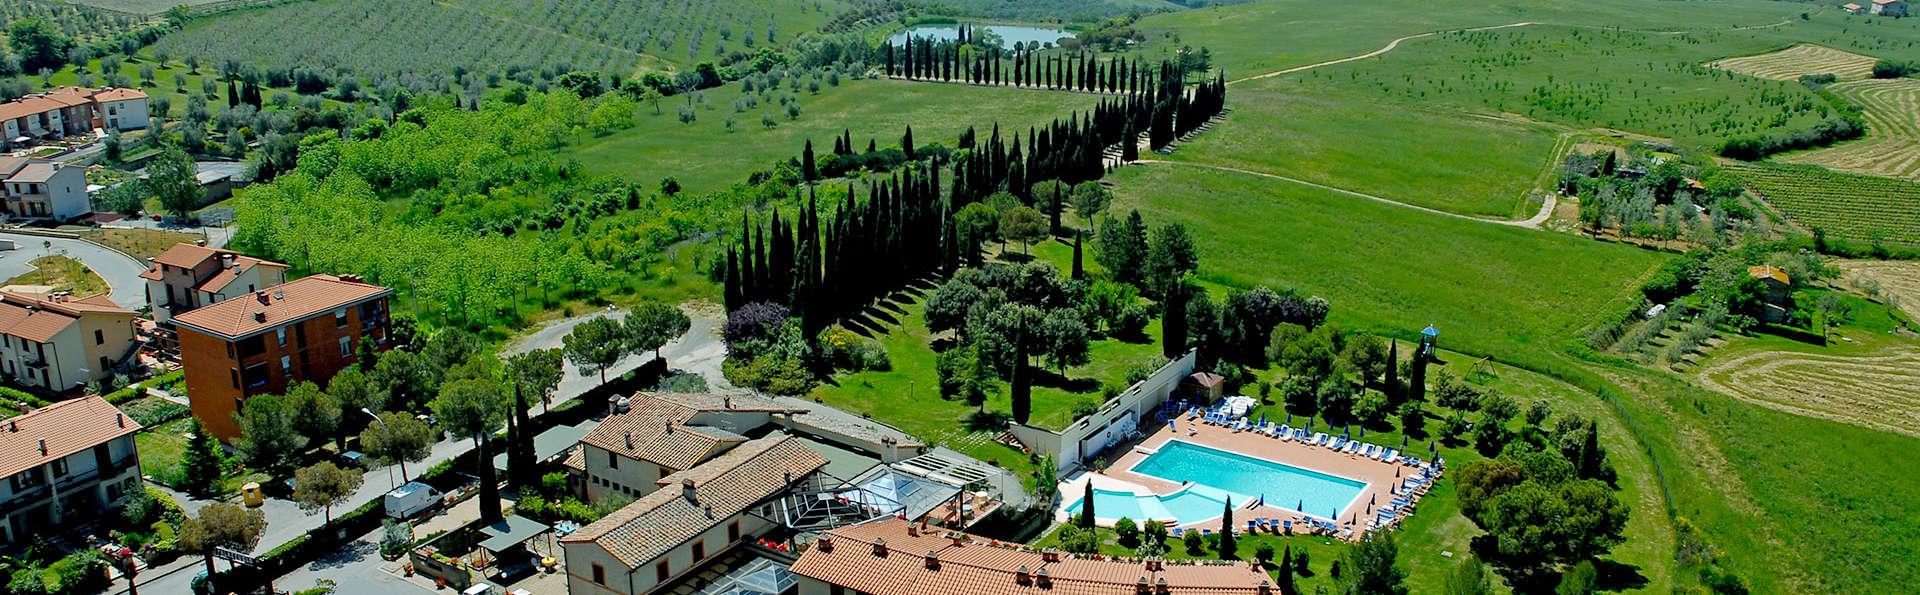 Weekend tra le colline toscane alle porte di Montalcino